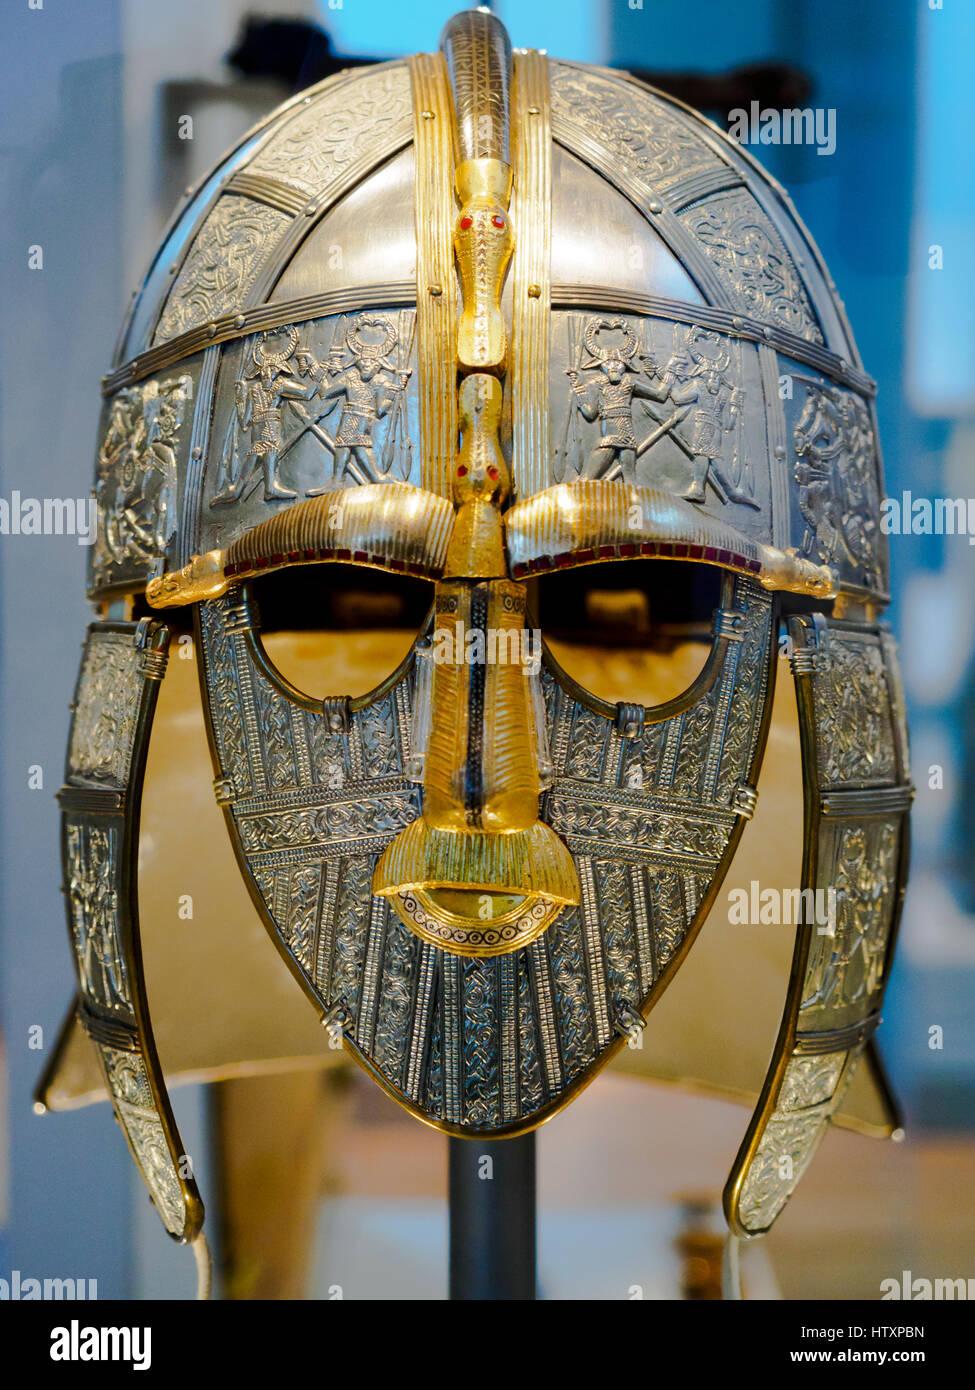 Sutton Hoo Helmet Replica For Sale Replica Of The Anglo